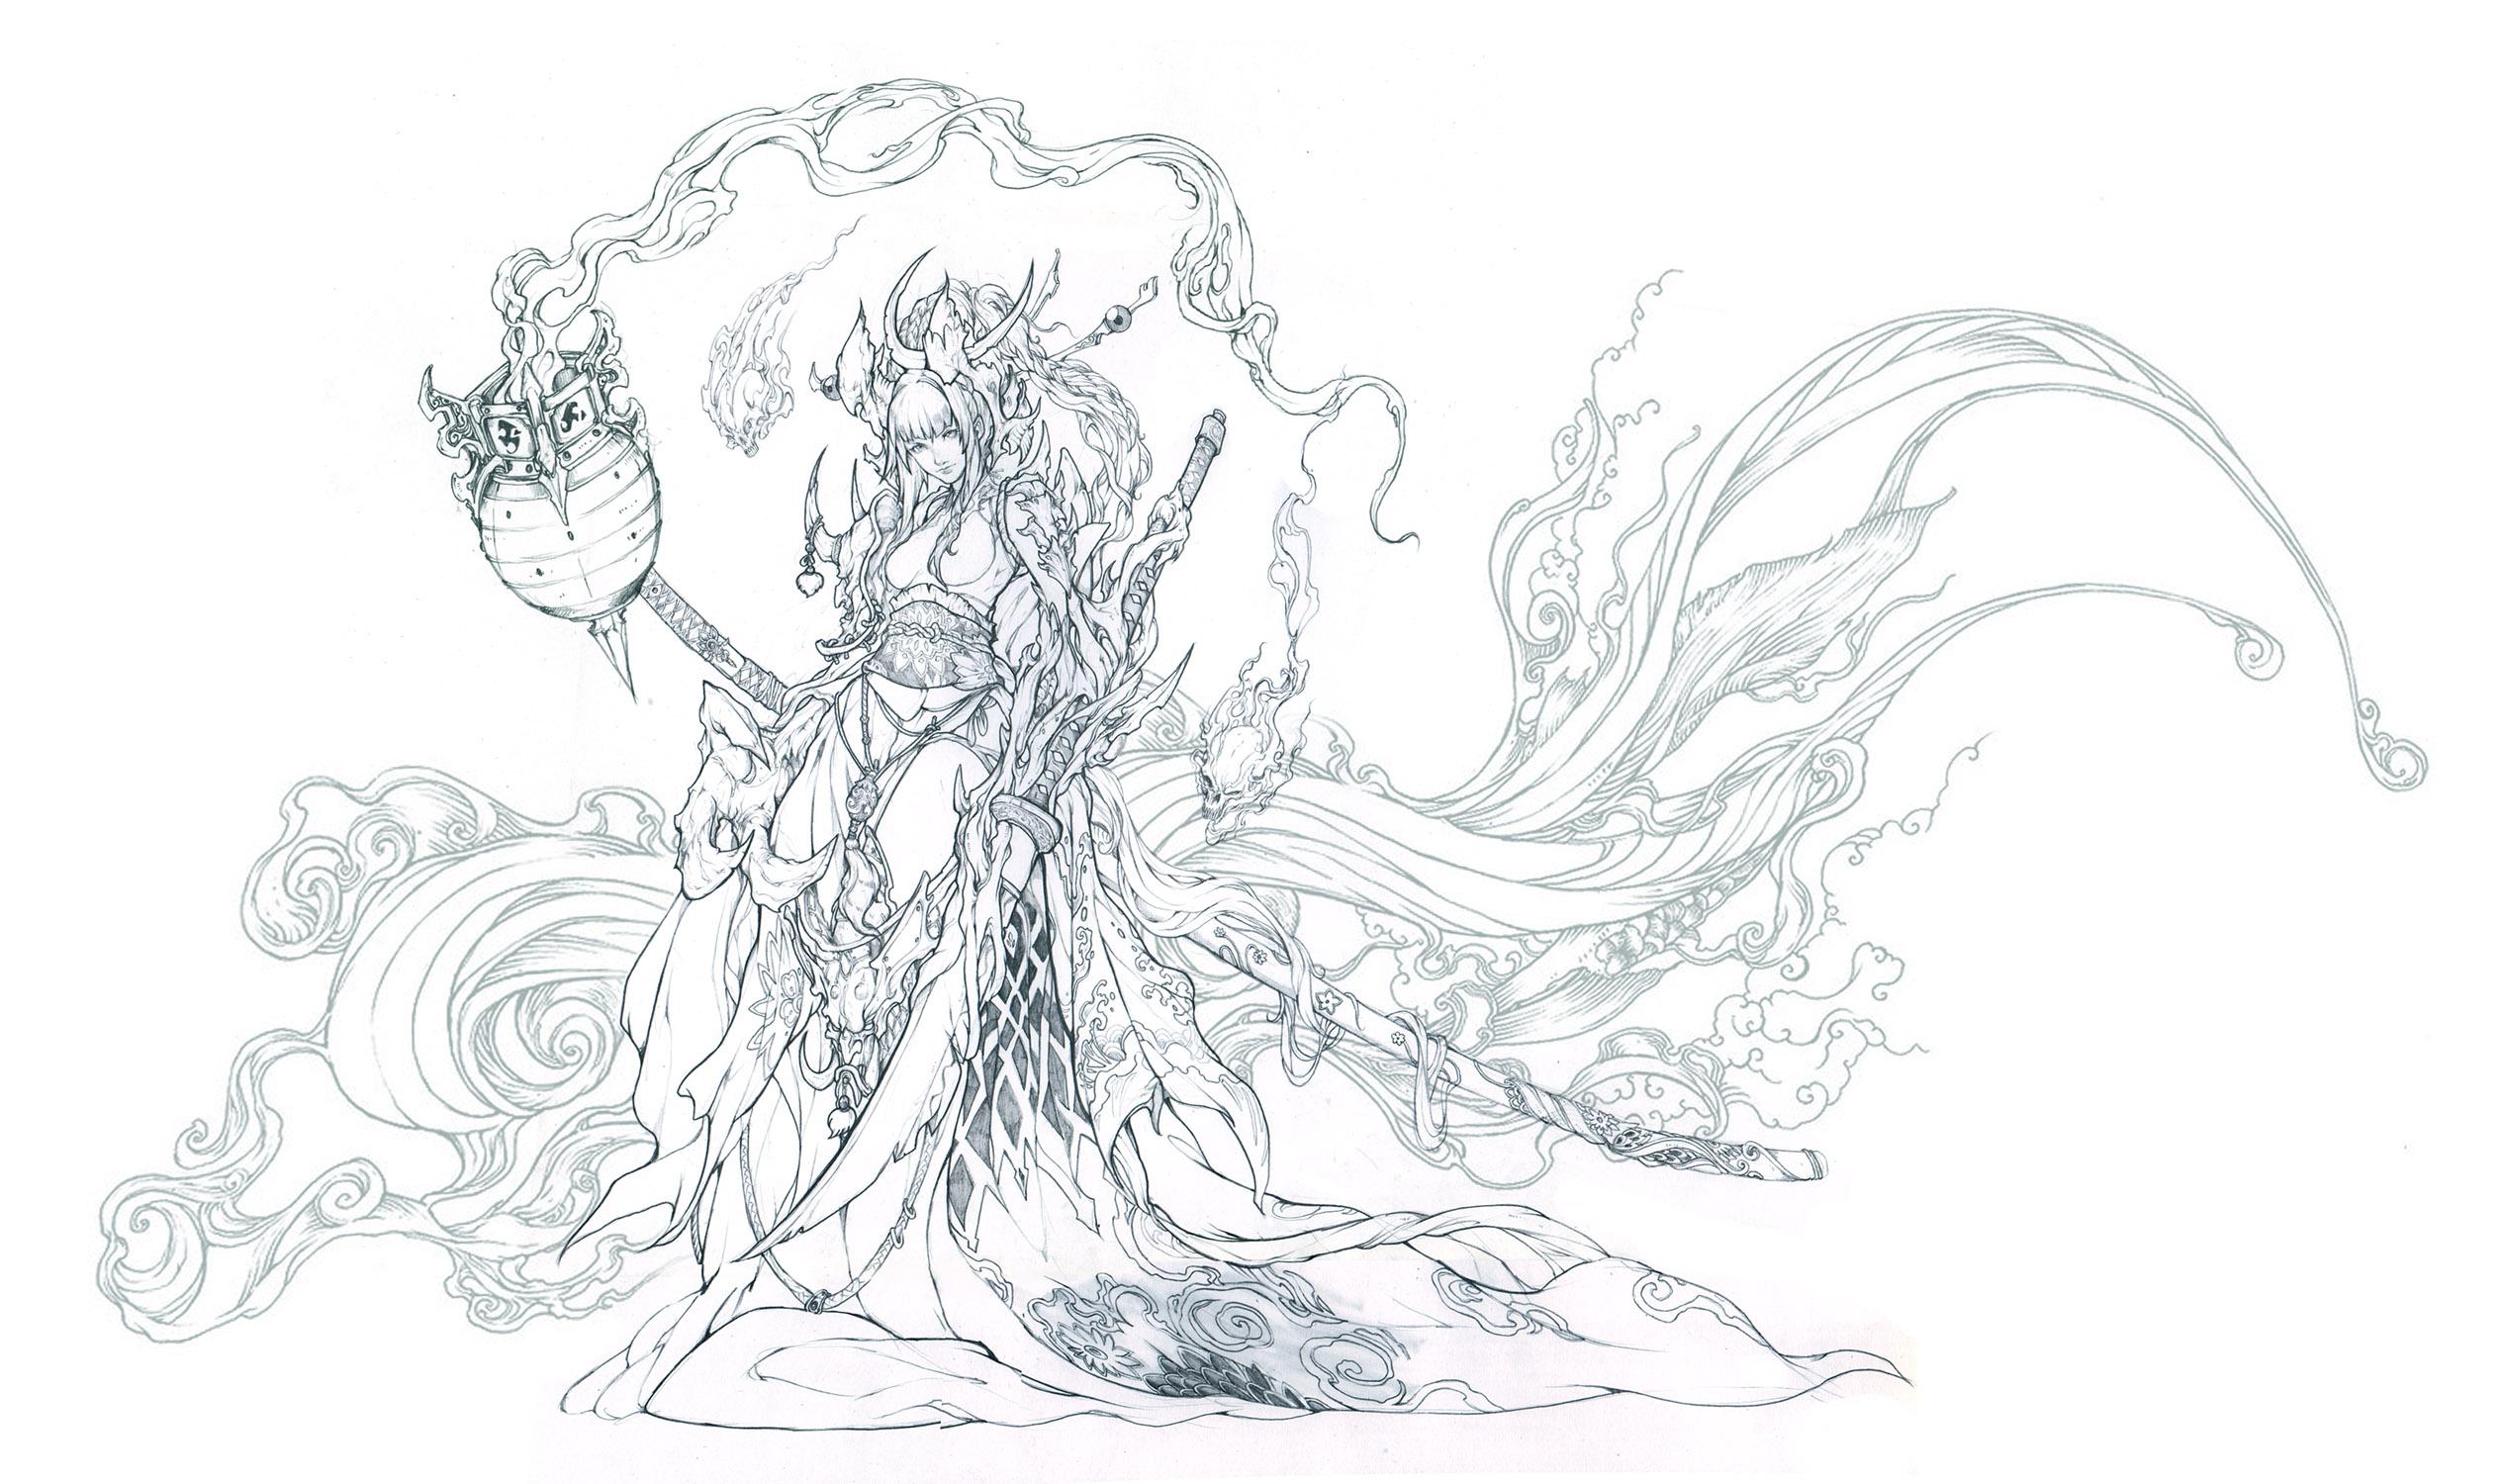 patreon bonus demon sword pencil lineart by muju on